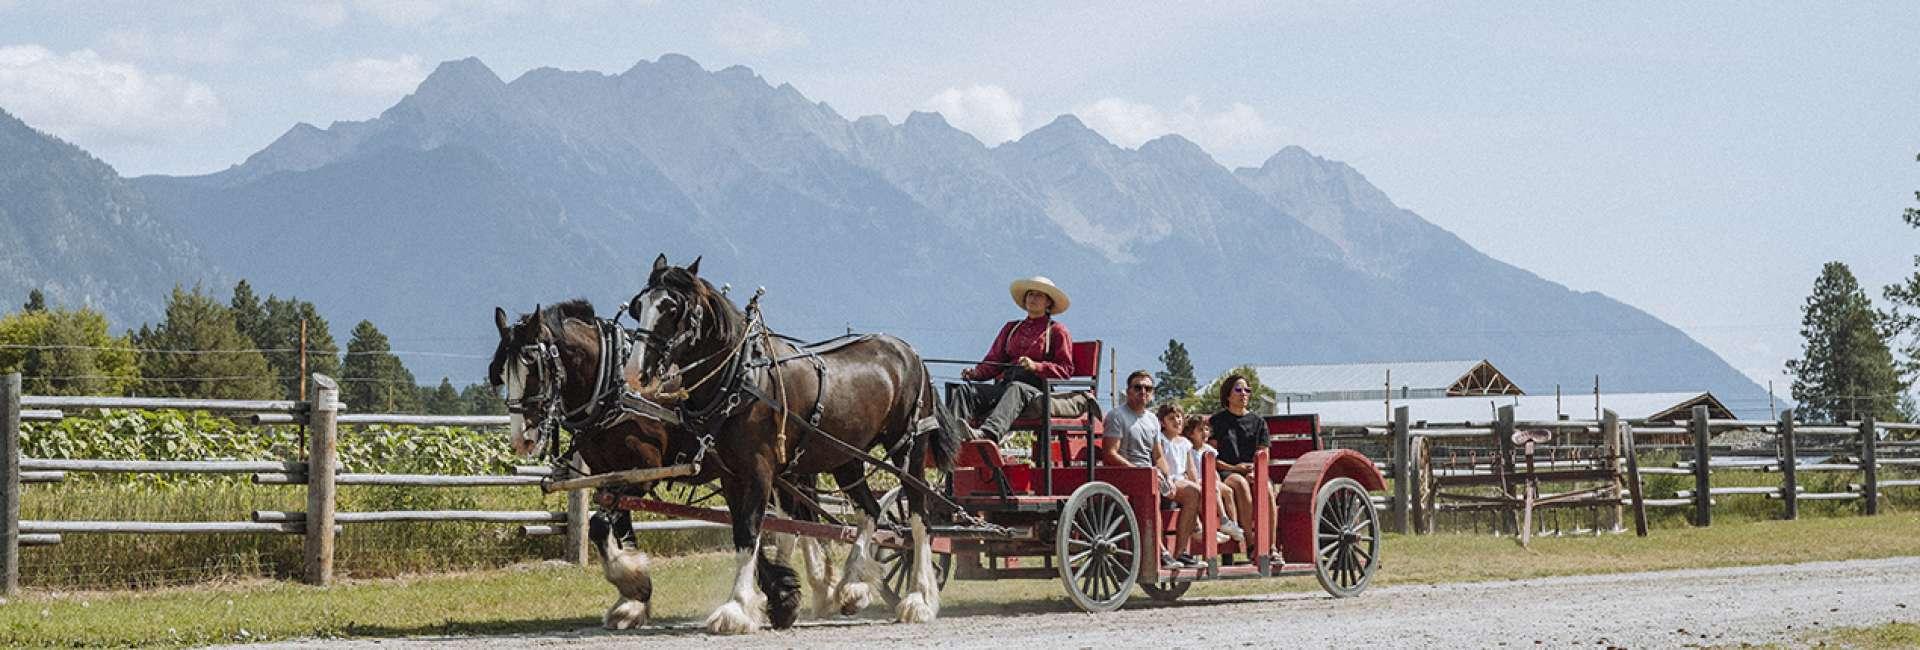 Fort Steele School Programs - Kootenay Rockies Tourism